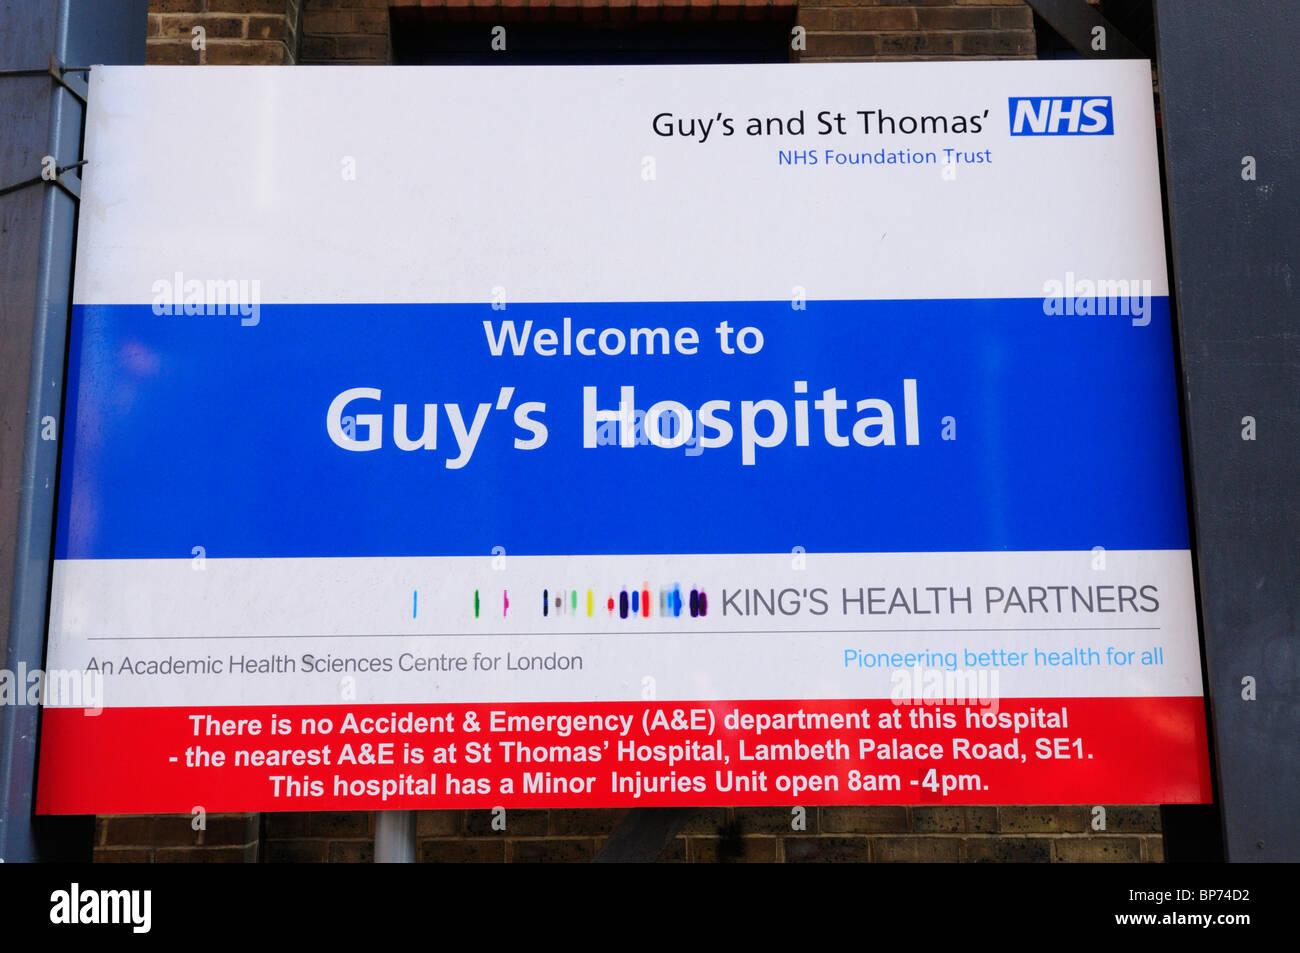 Welcome to Guy's Hospital sign, Southwark, London England, UK - Stock Image